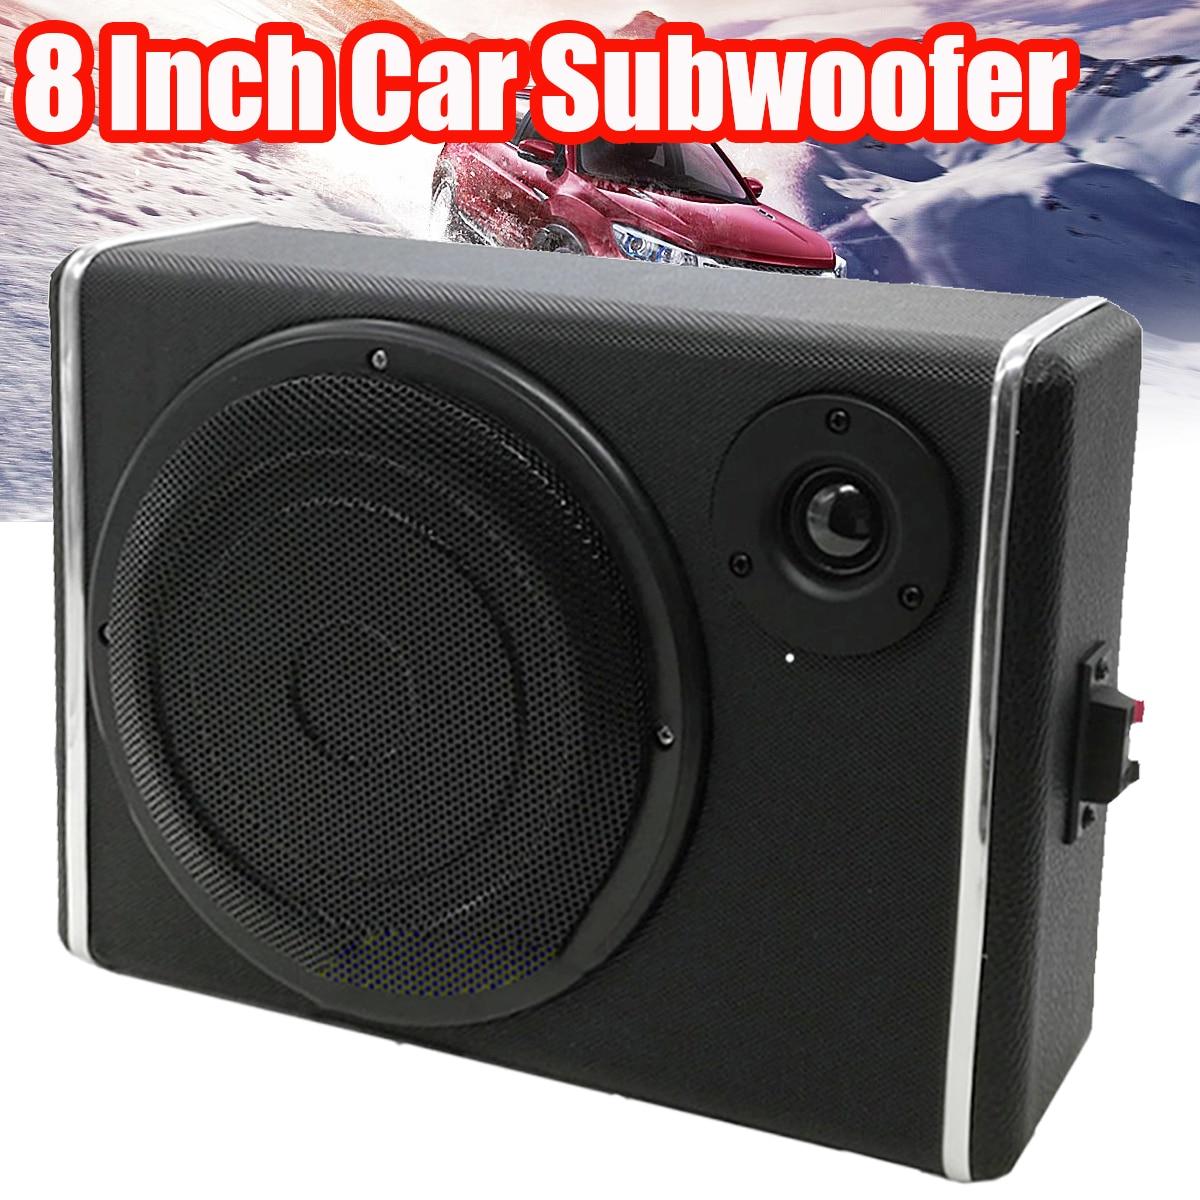 8 Inch Car Subwoofers Speaker Portable Auto Audio Loudspeaker Horn Car Stereo System Sound Subwoofer Speaker Car Sound ghxamp 3 inch 4ohm 30w midrange speaker car speaker mid human voice sound good loudspeaker for lg diy 2pcs